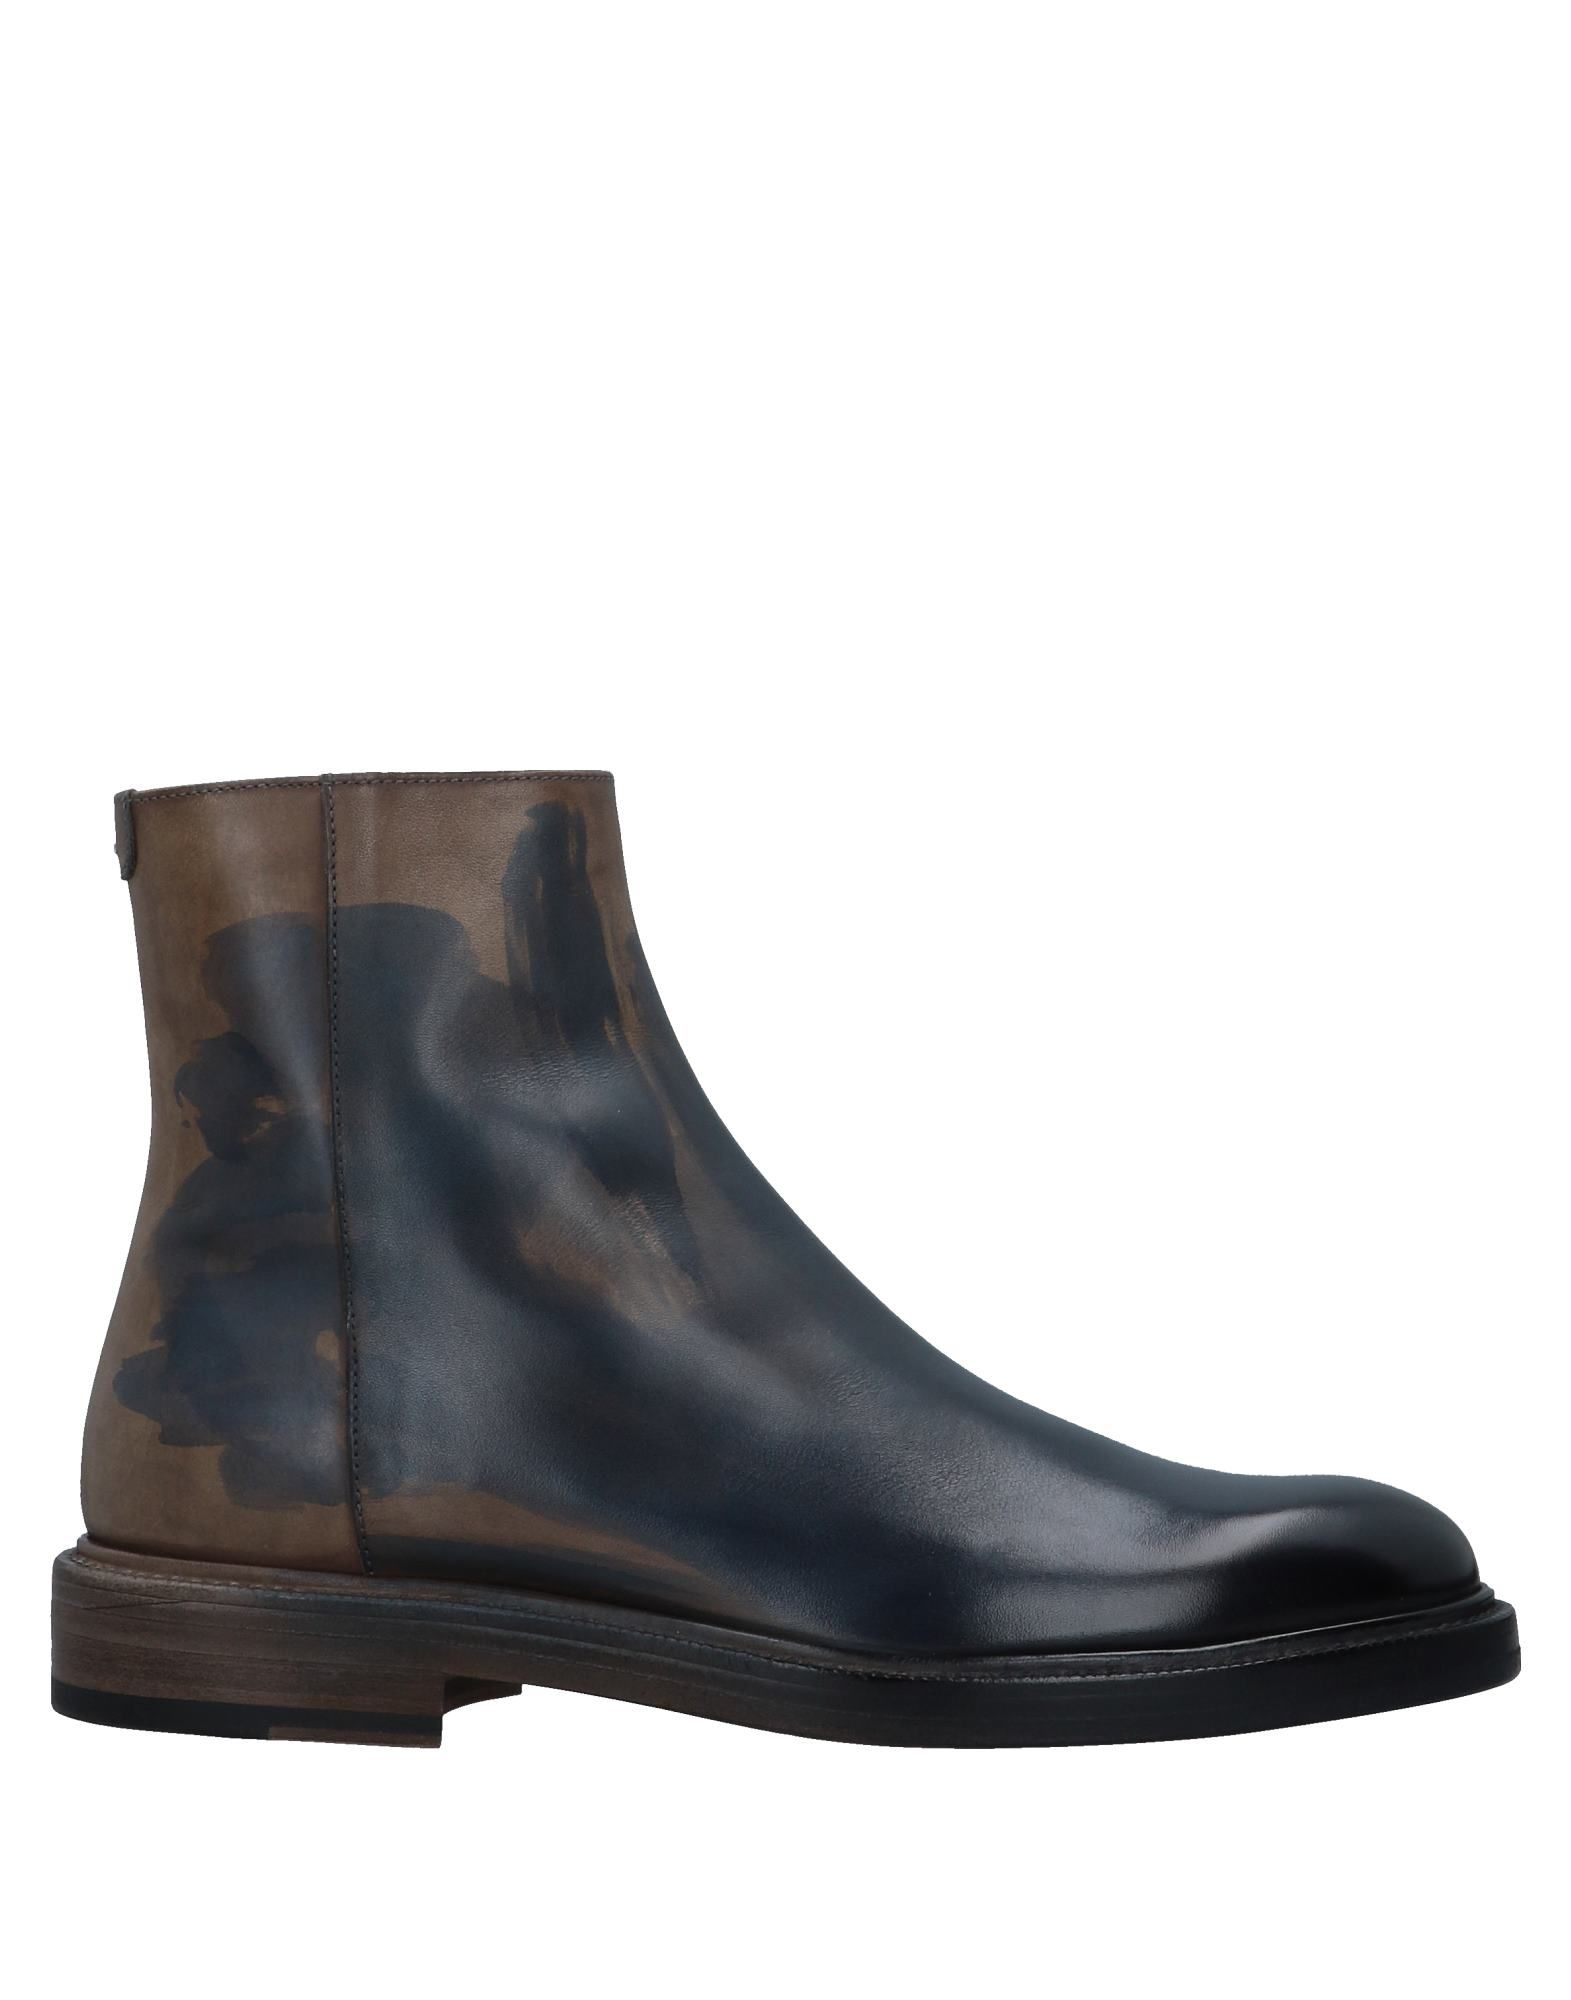 Maison Margiela Stiefelette Herren  11535557PQ Gute Qualität beliebte Schuhe Schuhe beliebte a9d1f0